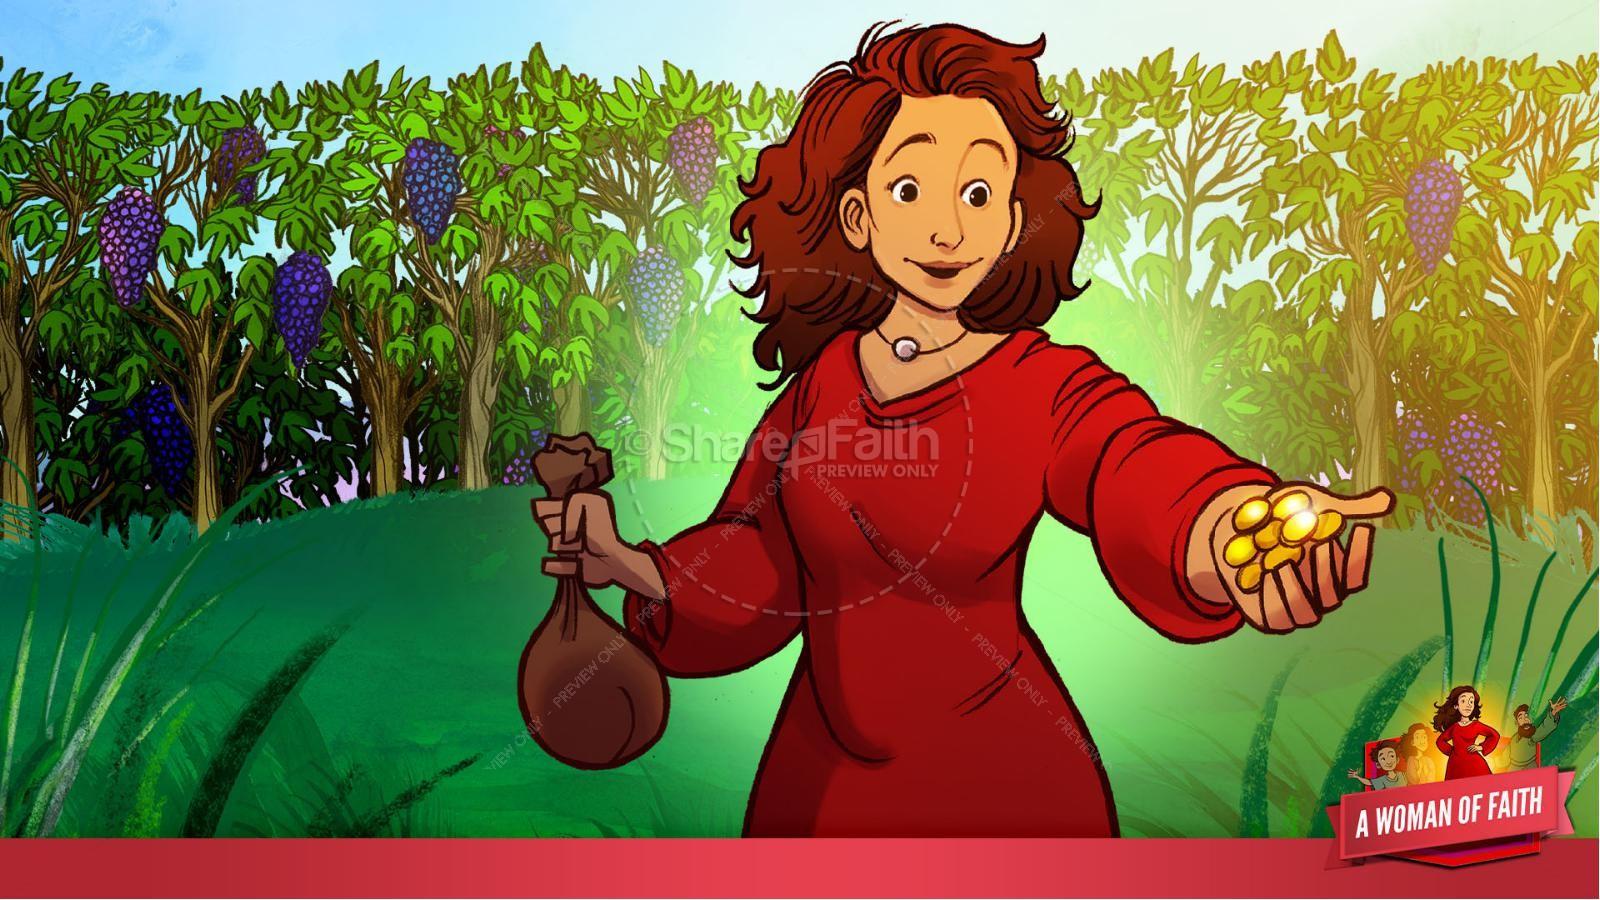 Proverbs 31 A Woman of Faith Kids Bible Story   slide 18